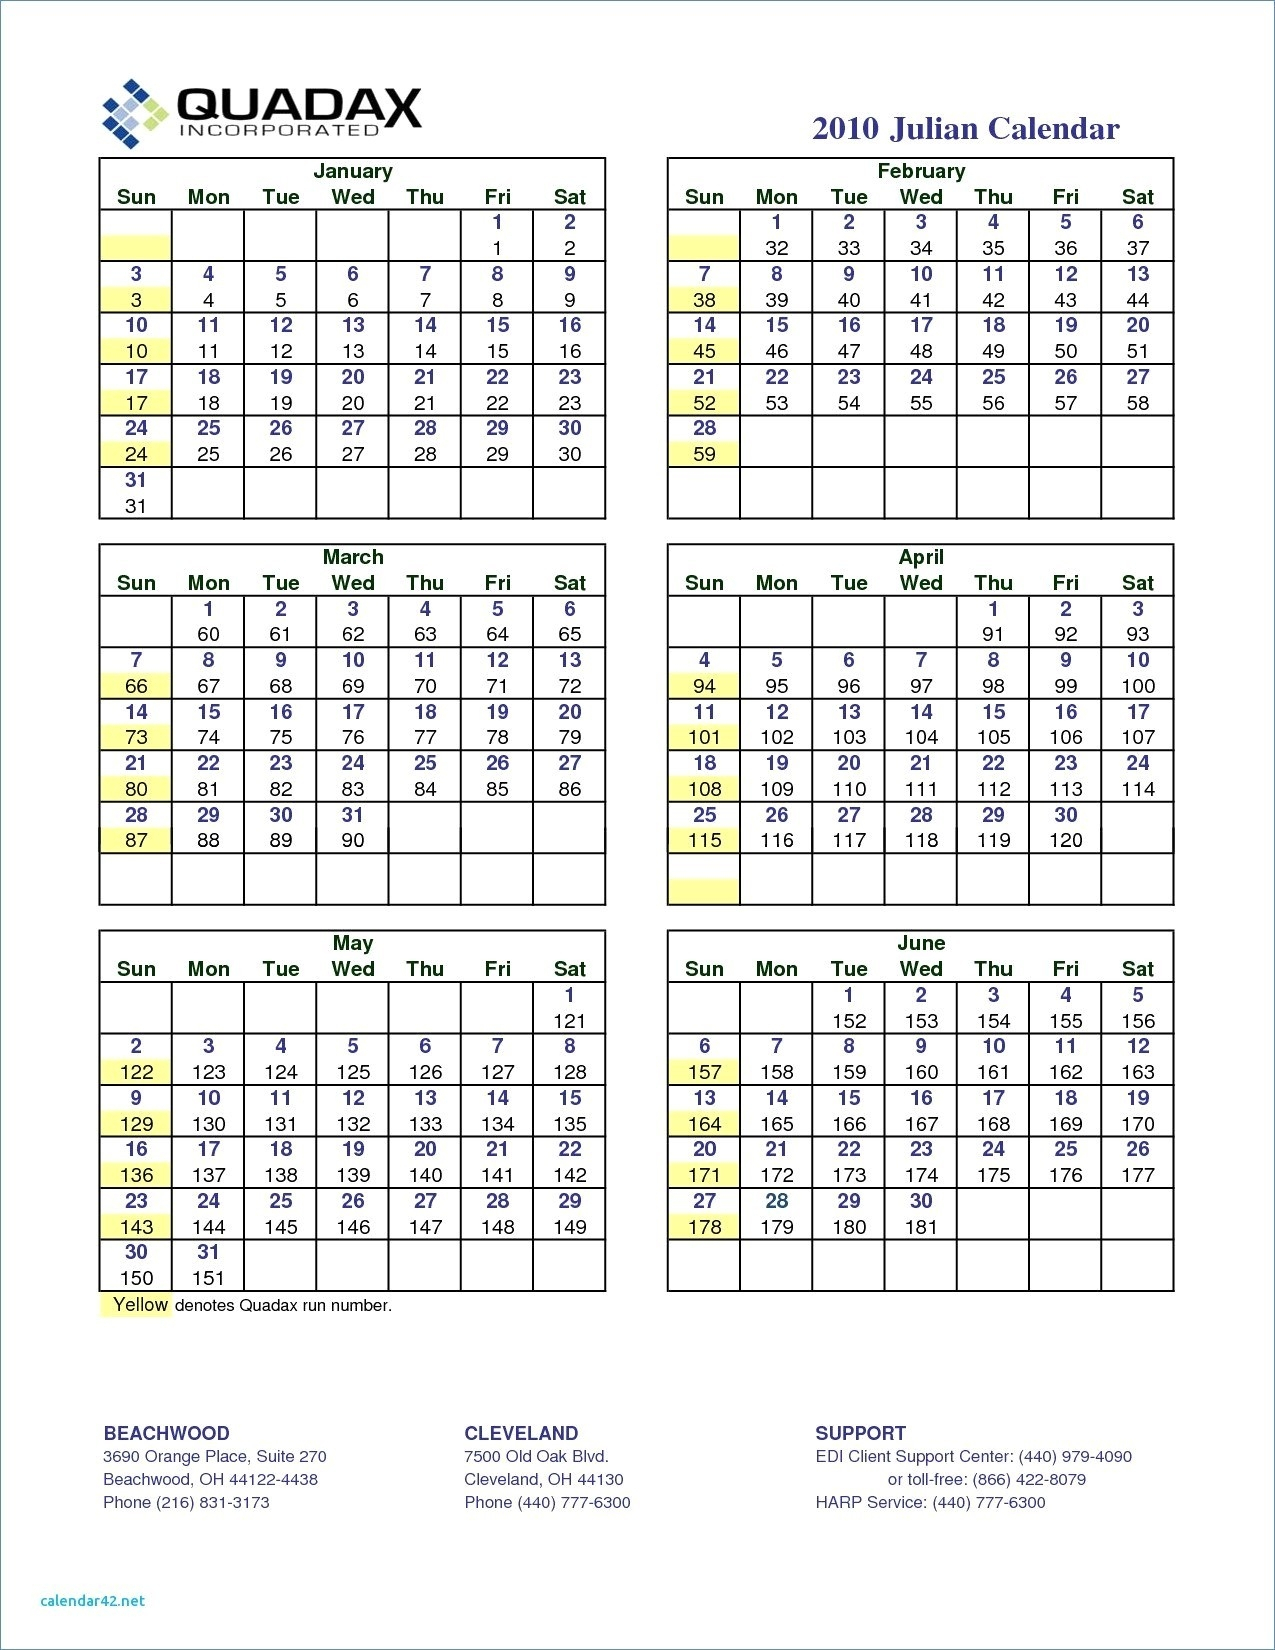 Quadax Julian Calendar 2020 Pdf | Example Calendar Printable throughout Julian Calendar 2020 - Quadax